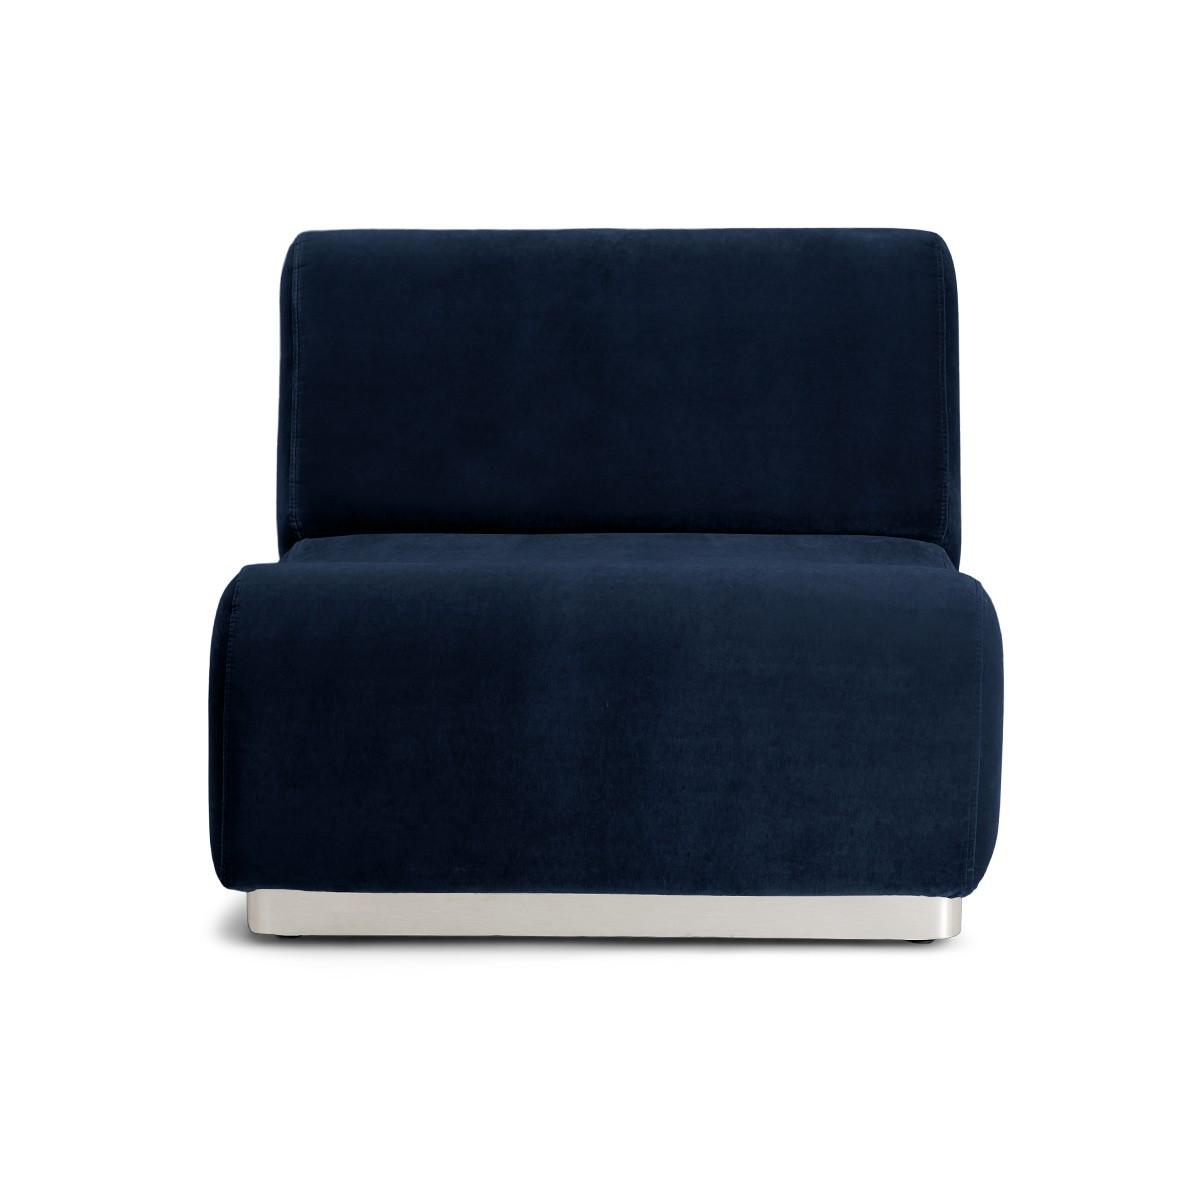 Chauffeuse modulable Rotondo velours bleu nuit